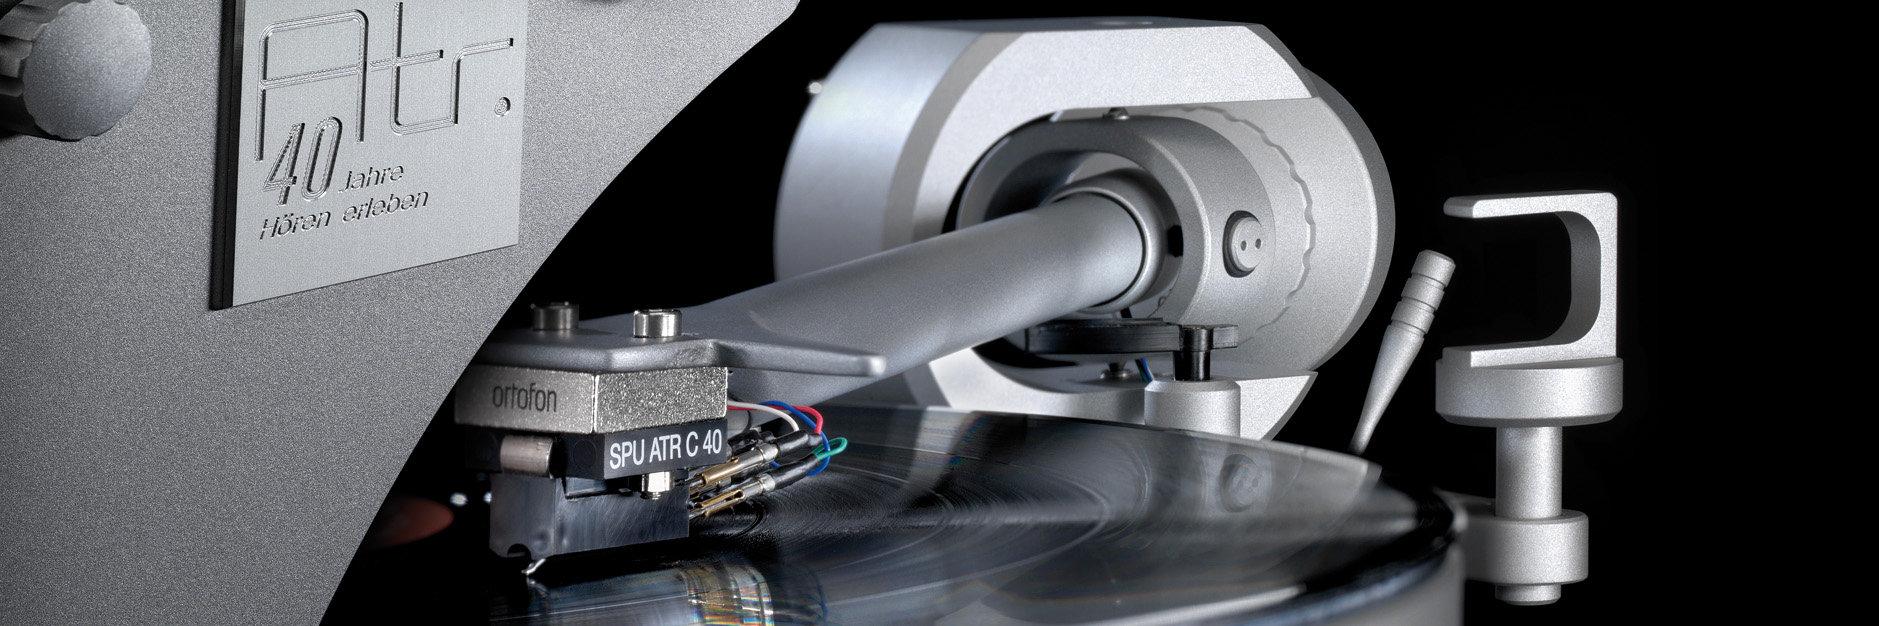 Audio Note UK Meishu Phono Silver Tonmeister